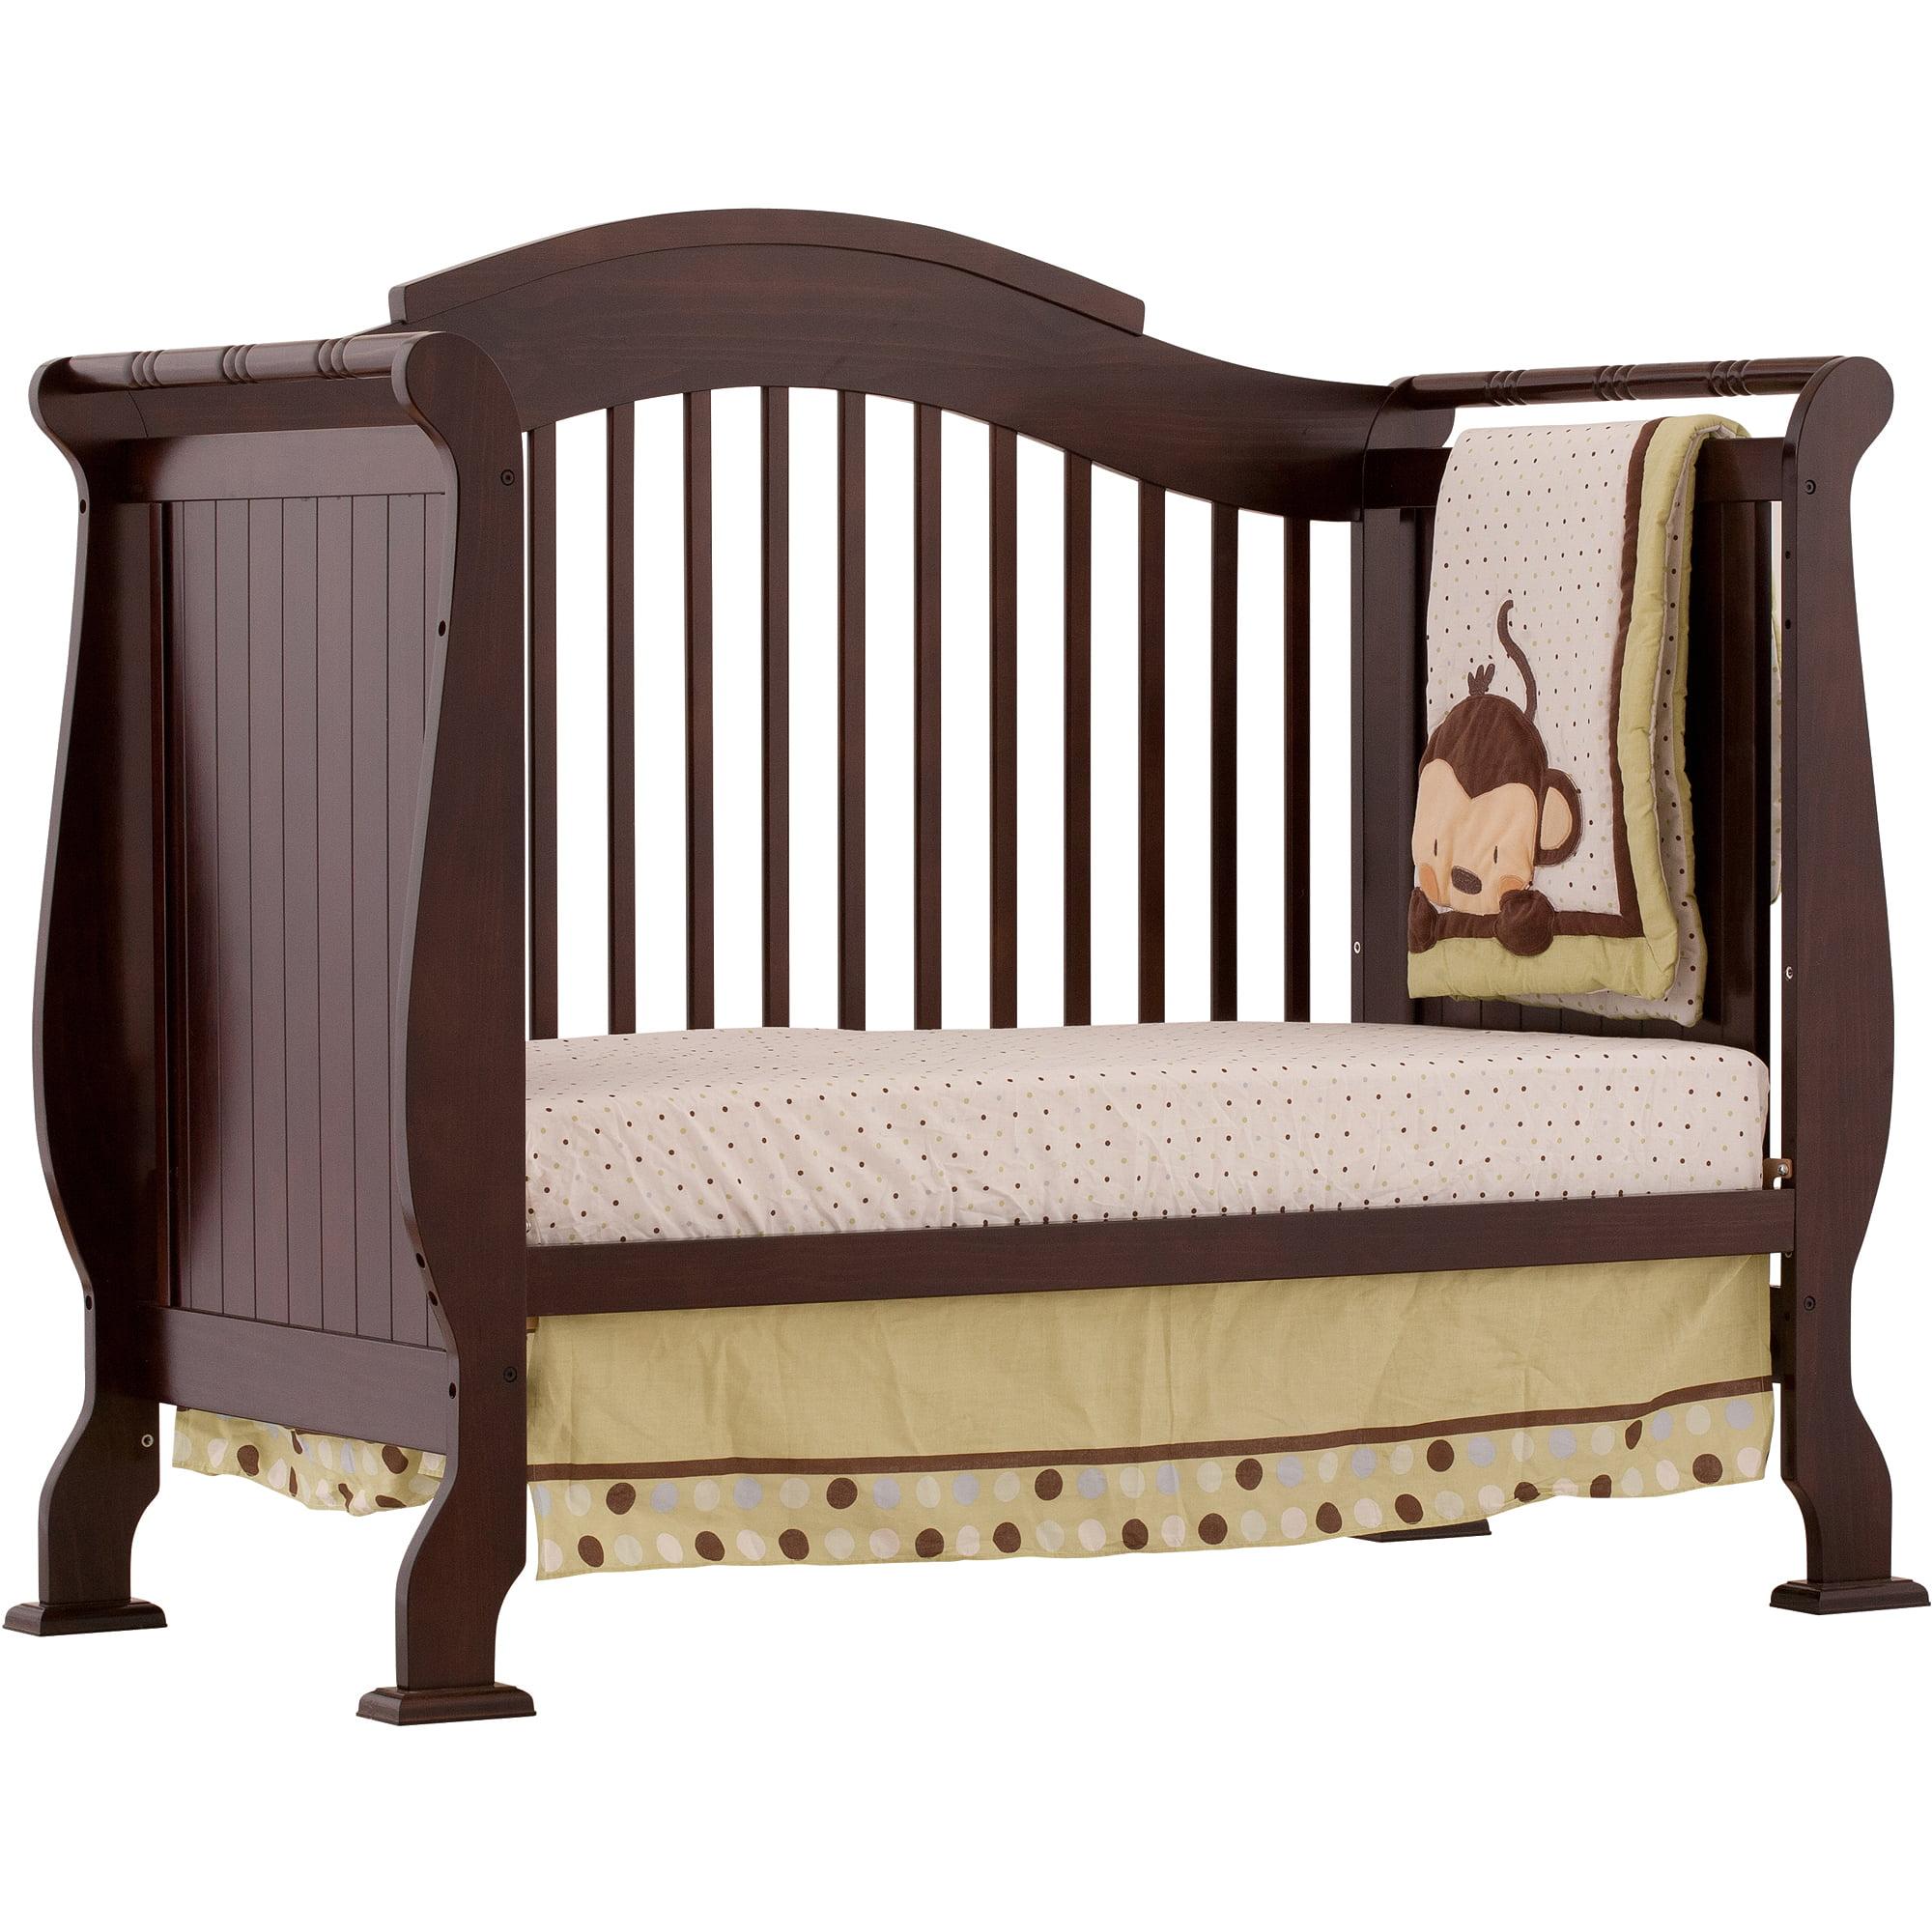 in com storkcraft walmart ip stork convertible white craft tuscany crib cribs